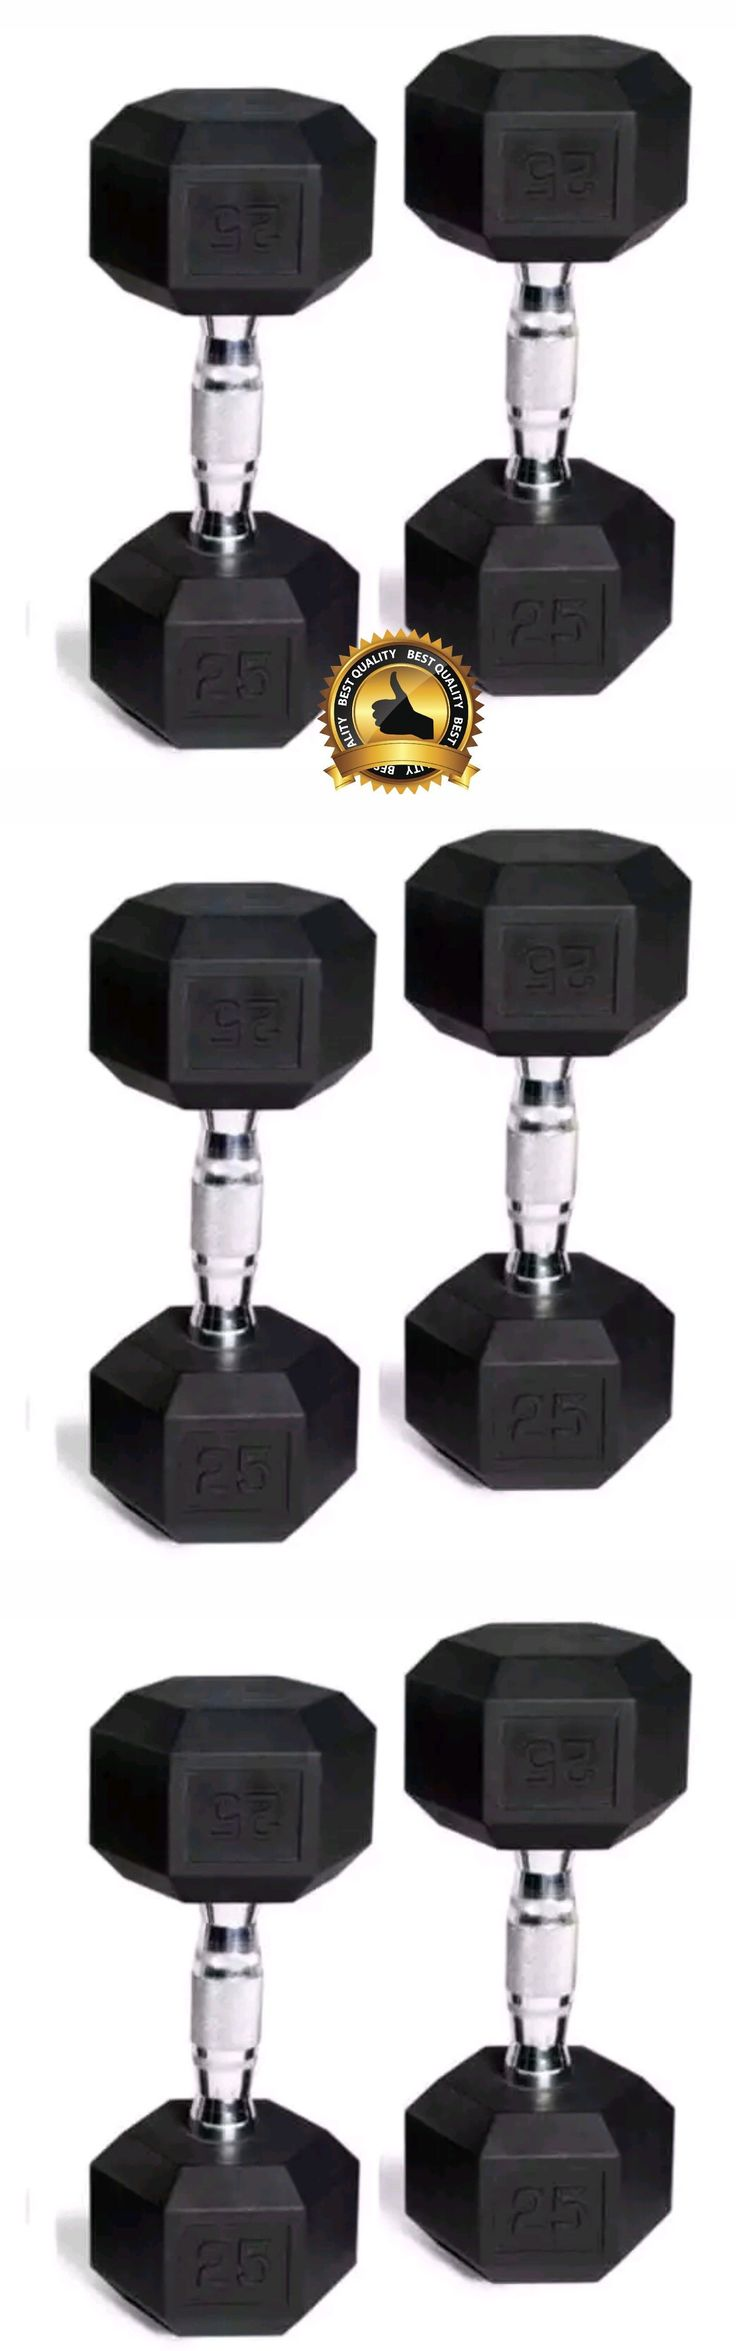 Dumbbells 137865: Cap Barbell Rubber-Coated Hex Dumbbells, Set Of 2, 25 Lb Each -> BUY IT NOW ONLY: $54 on eBay!